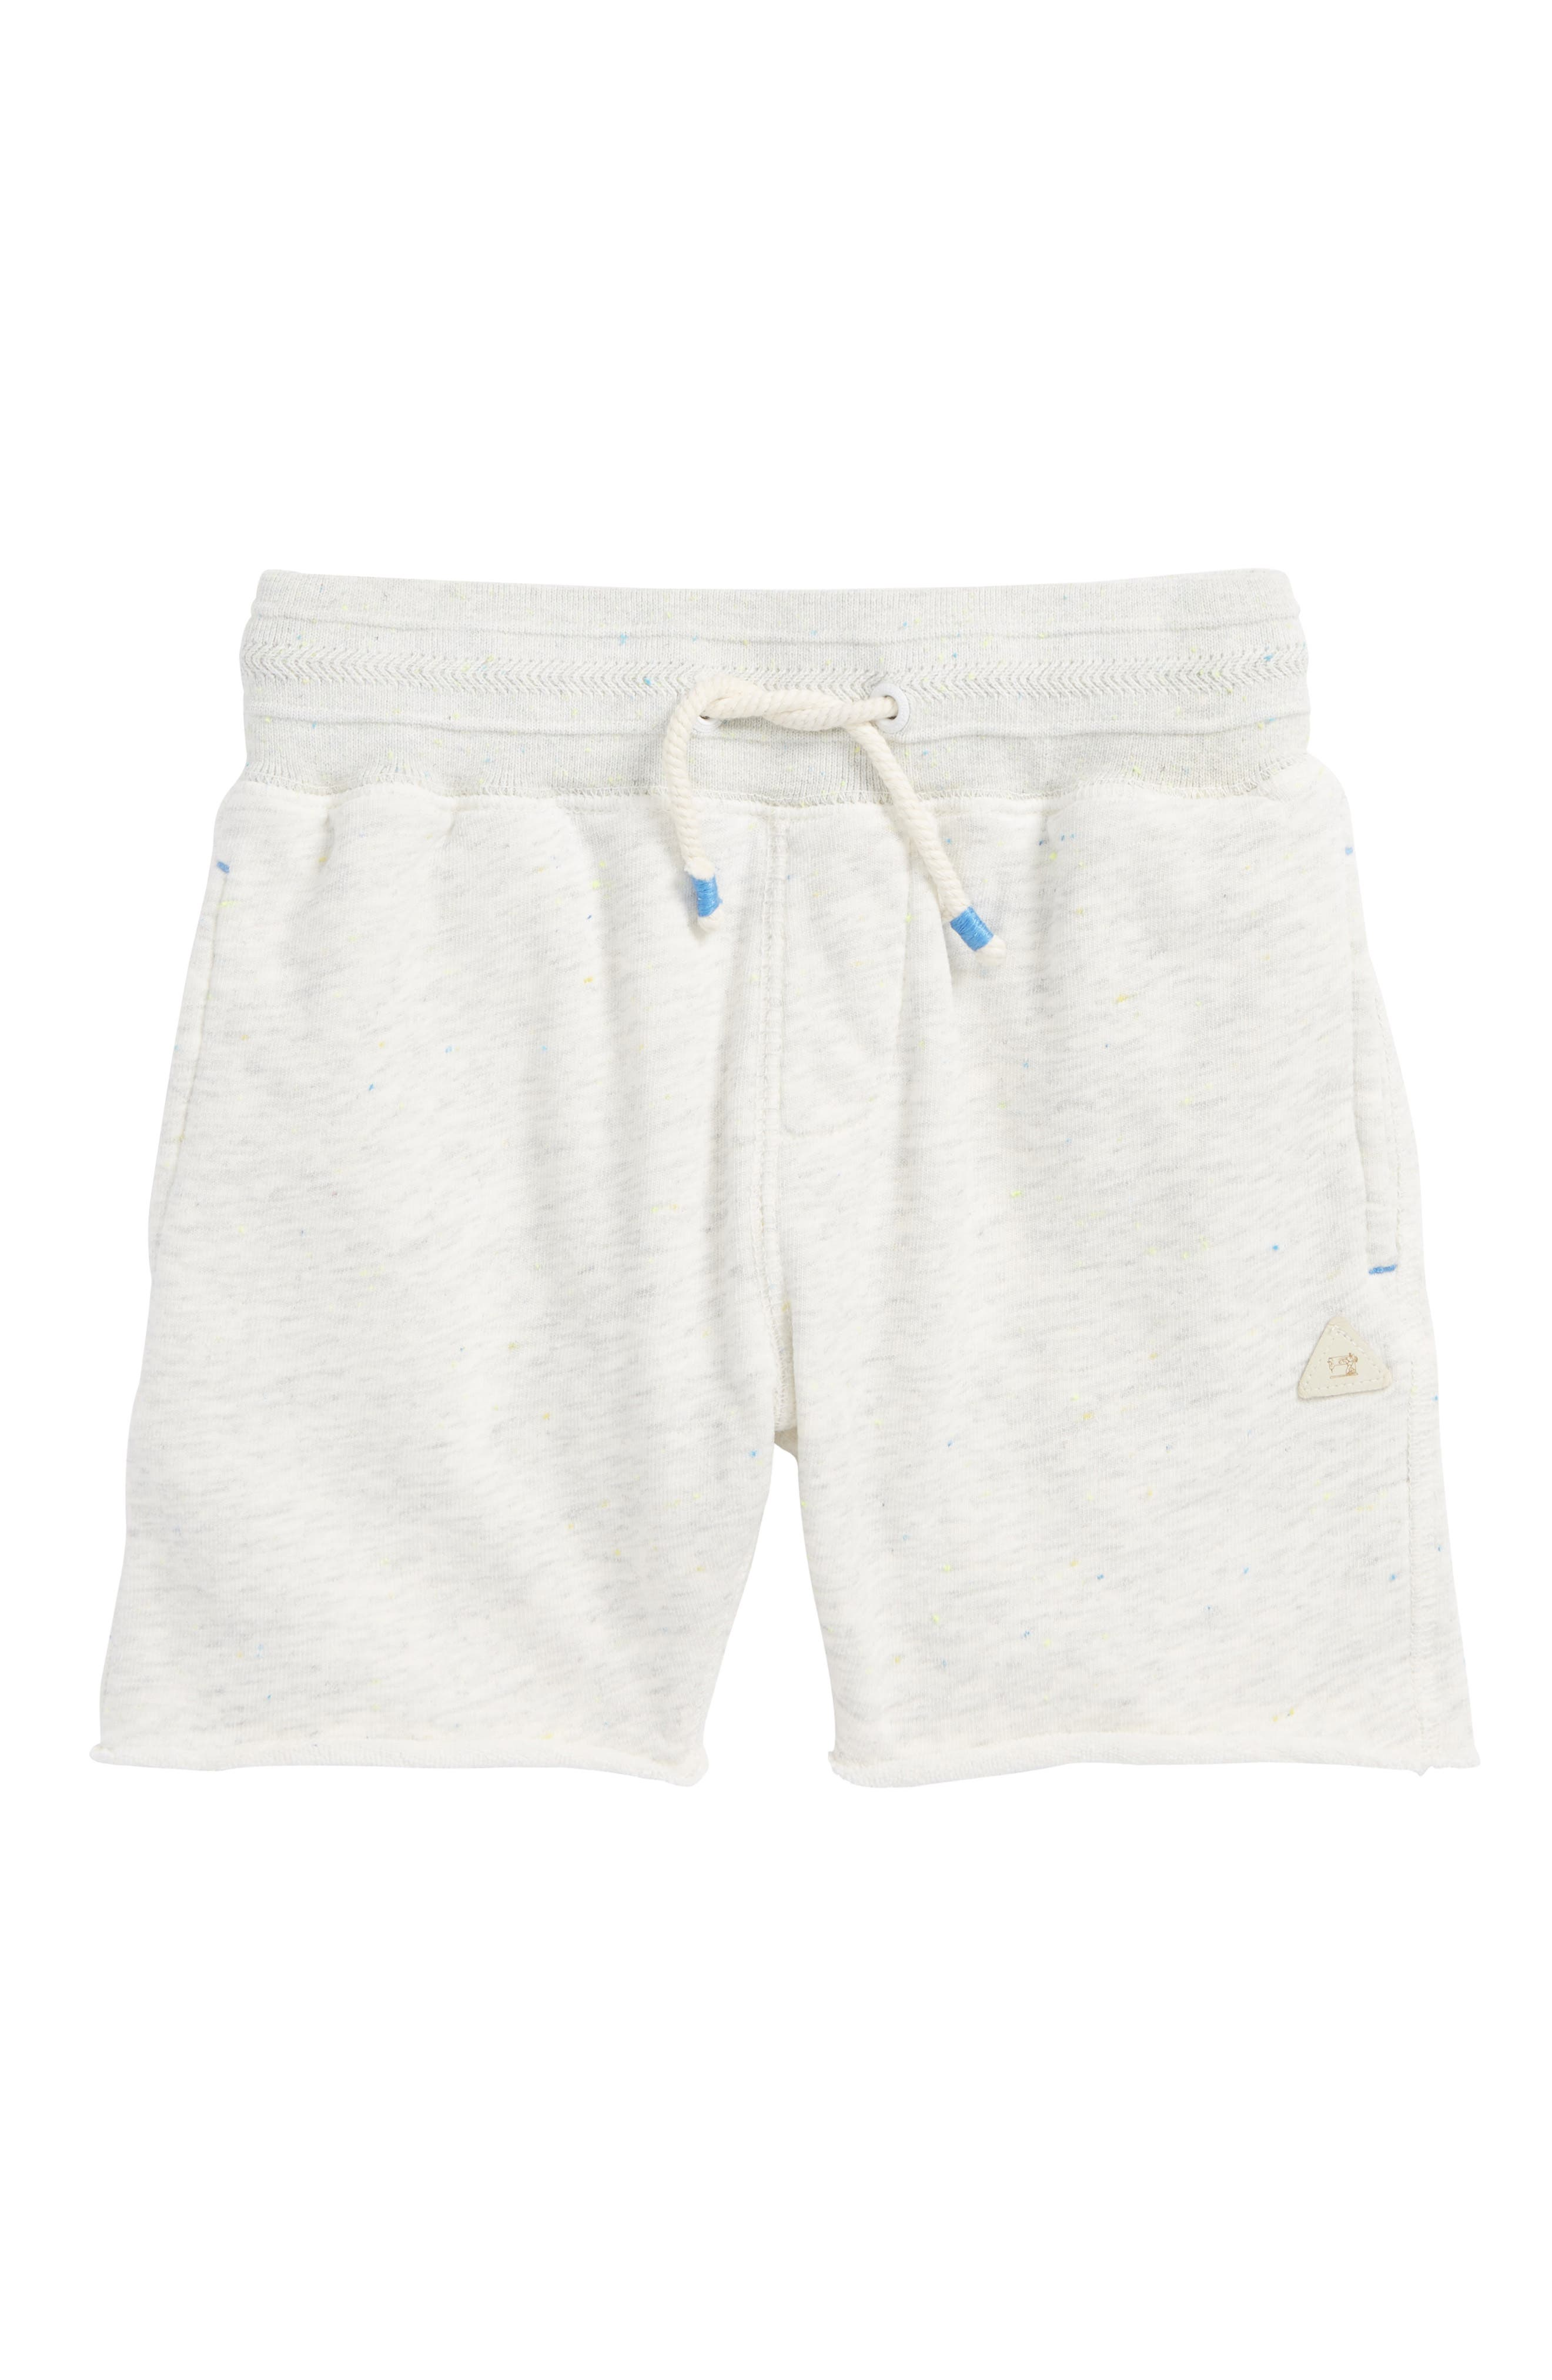 Pool Side Knit Shorts,                         Main,                         color, Ecru